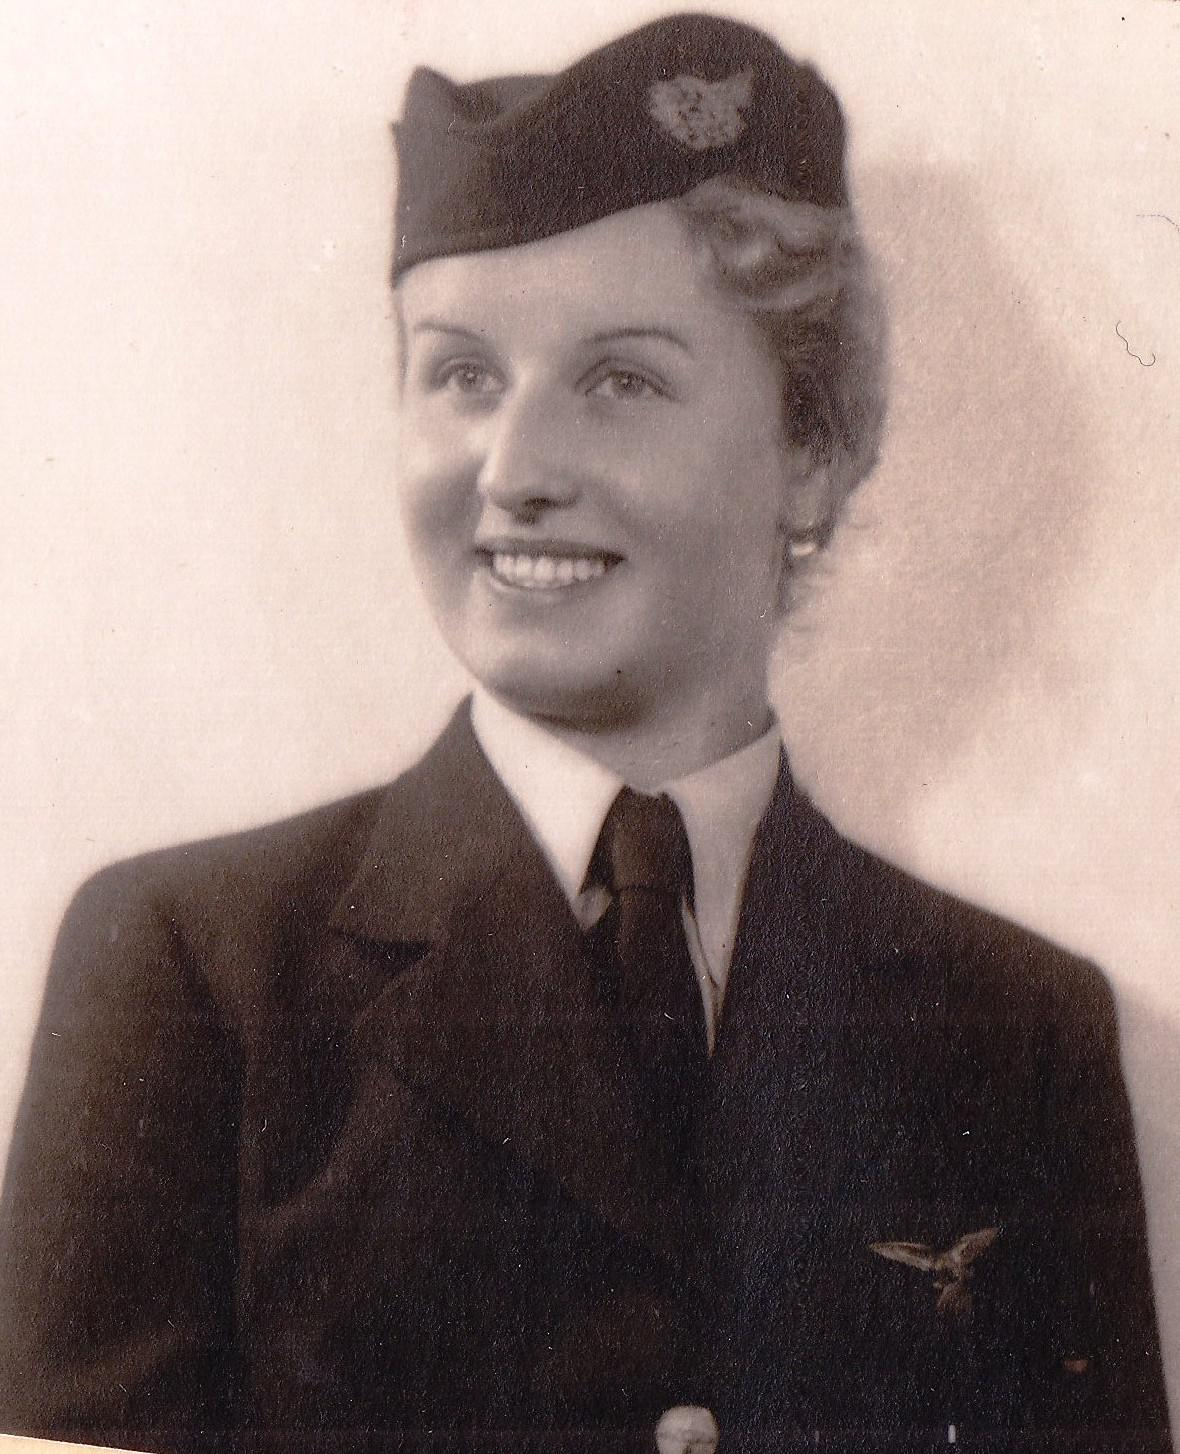 M. Stará v roce 1937